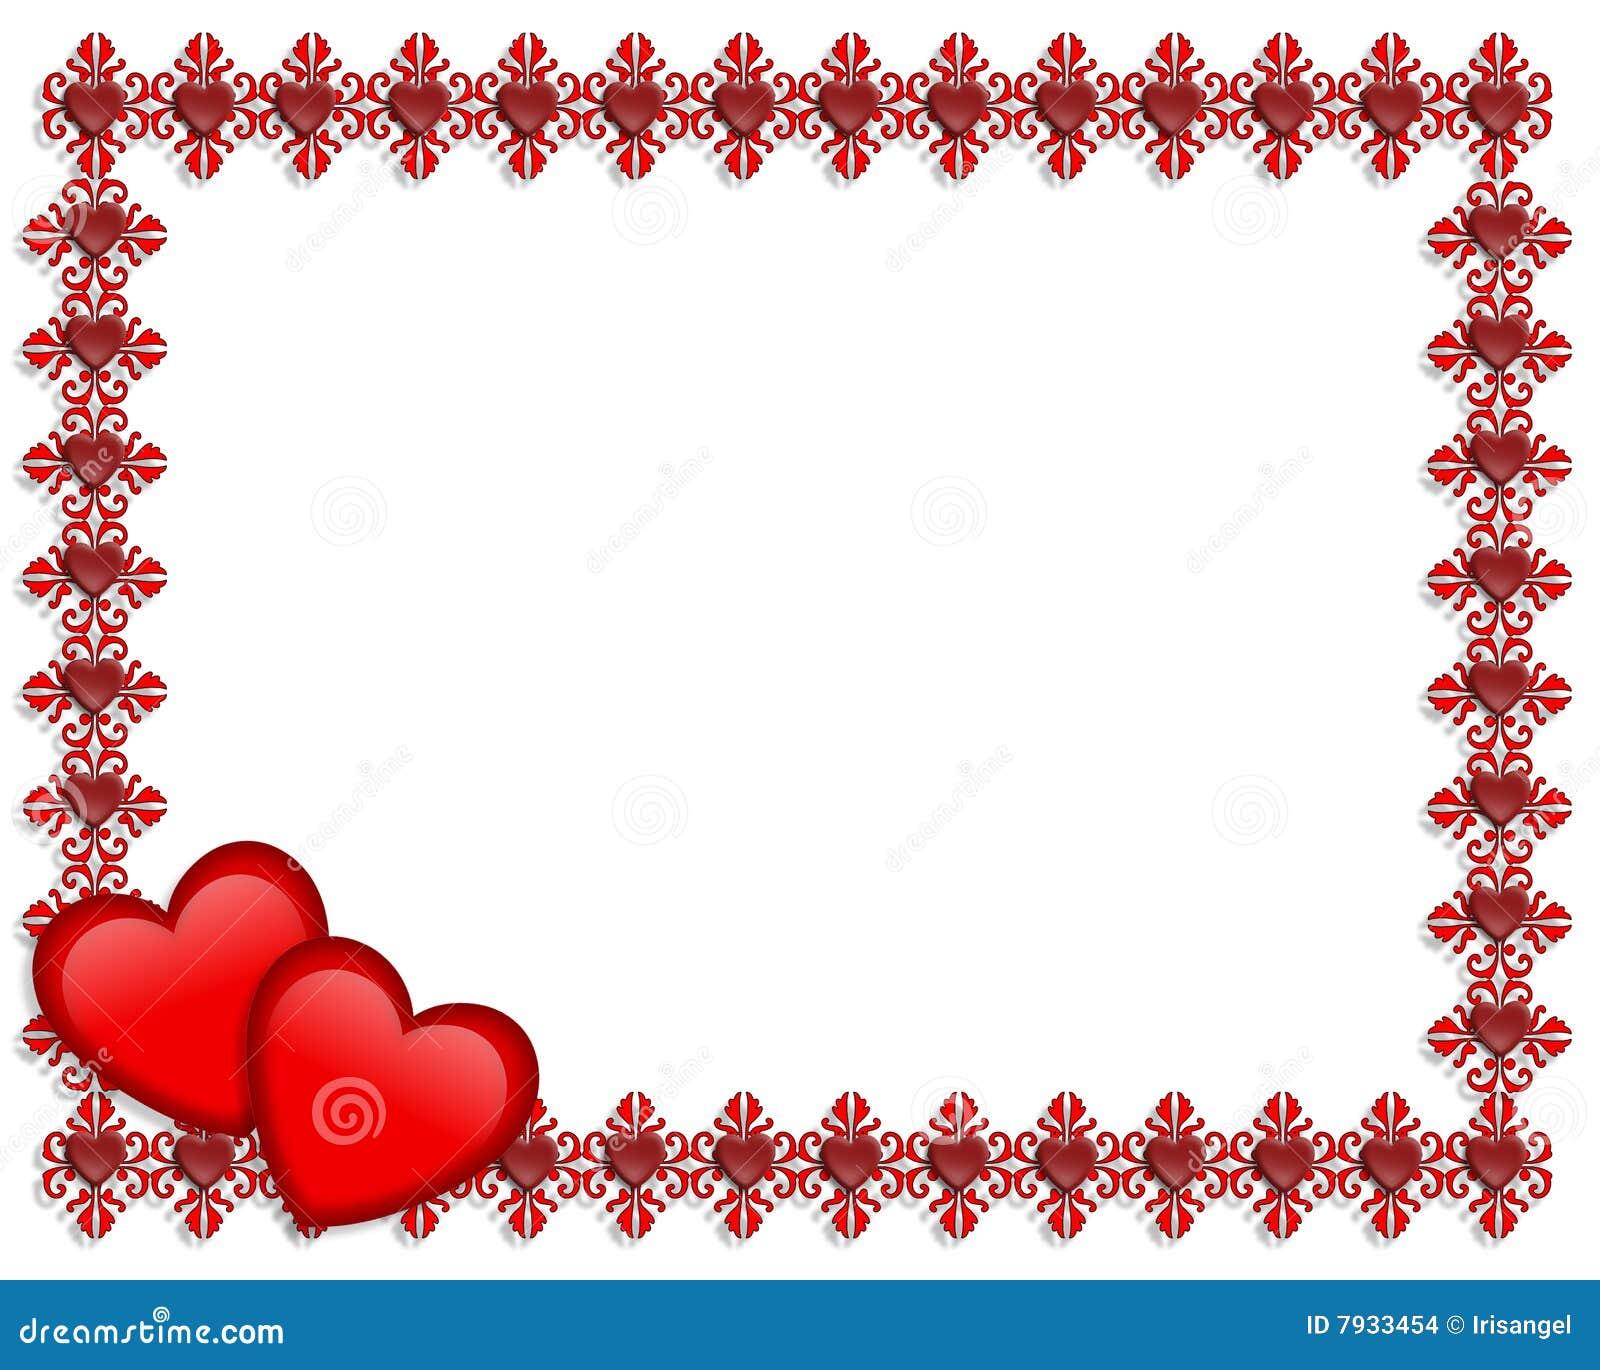 Valentines Day Border Hearts Stock Illustration - Illustration of ...